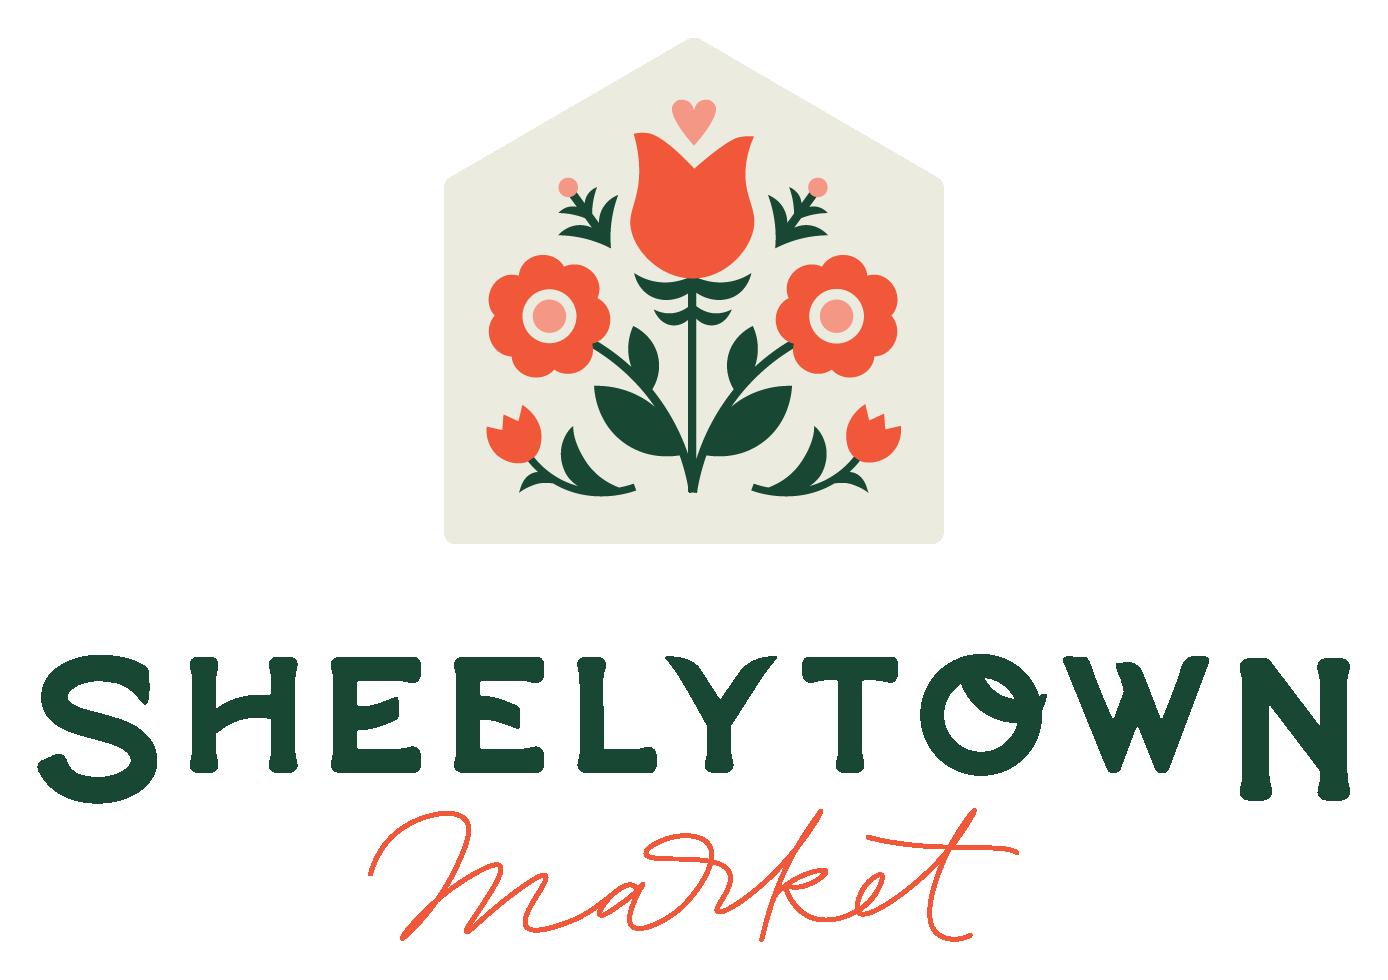 Sheelytown Market